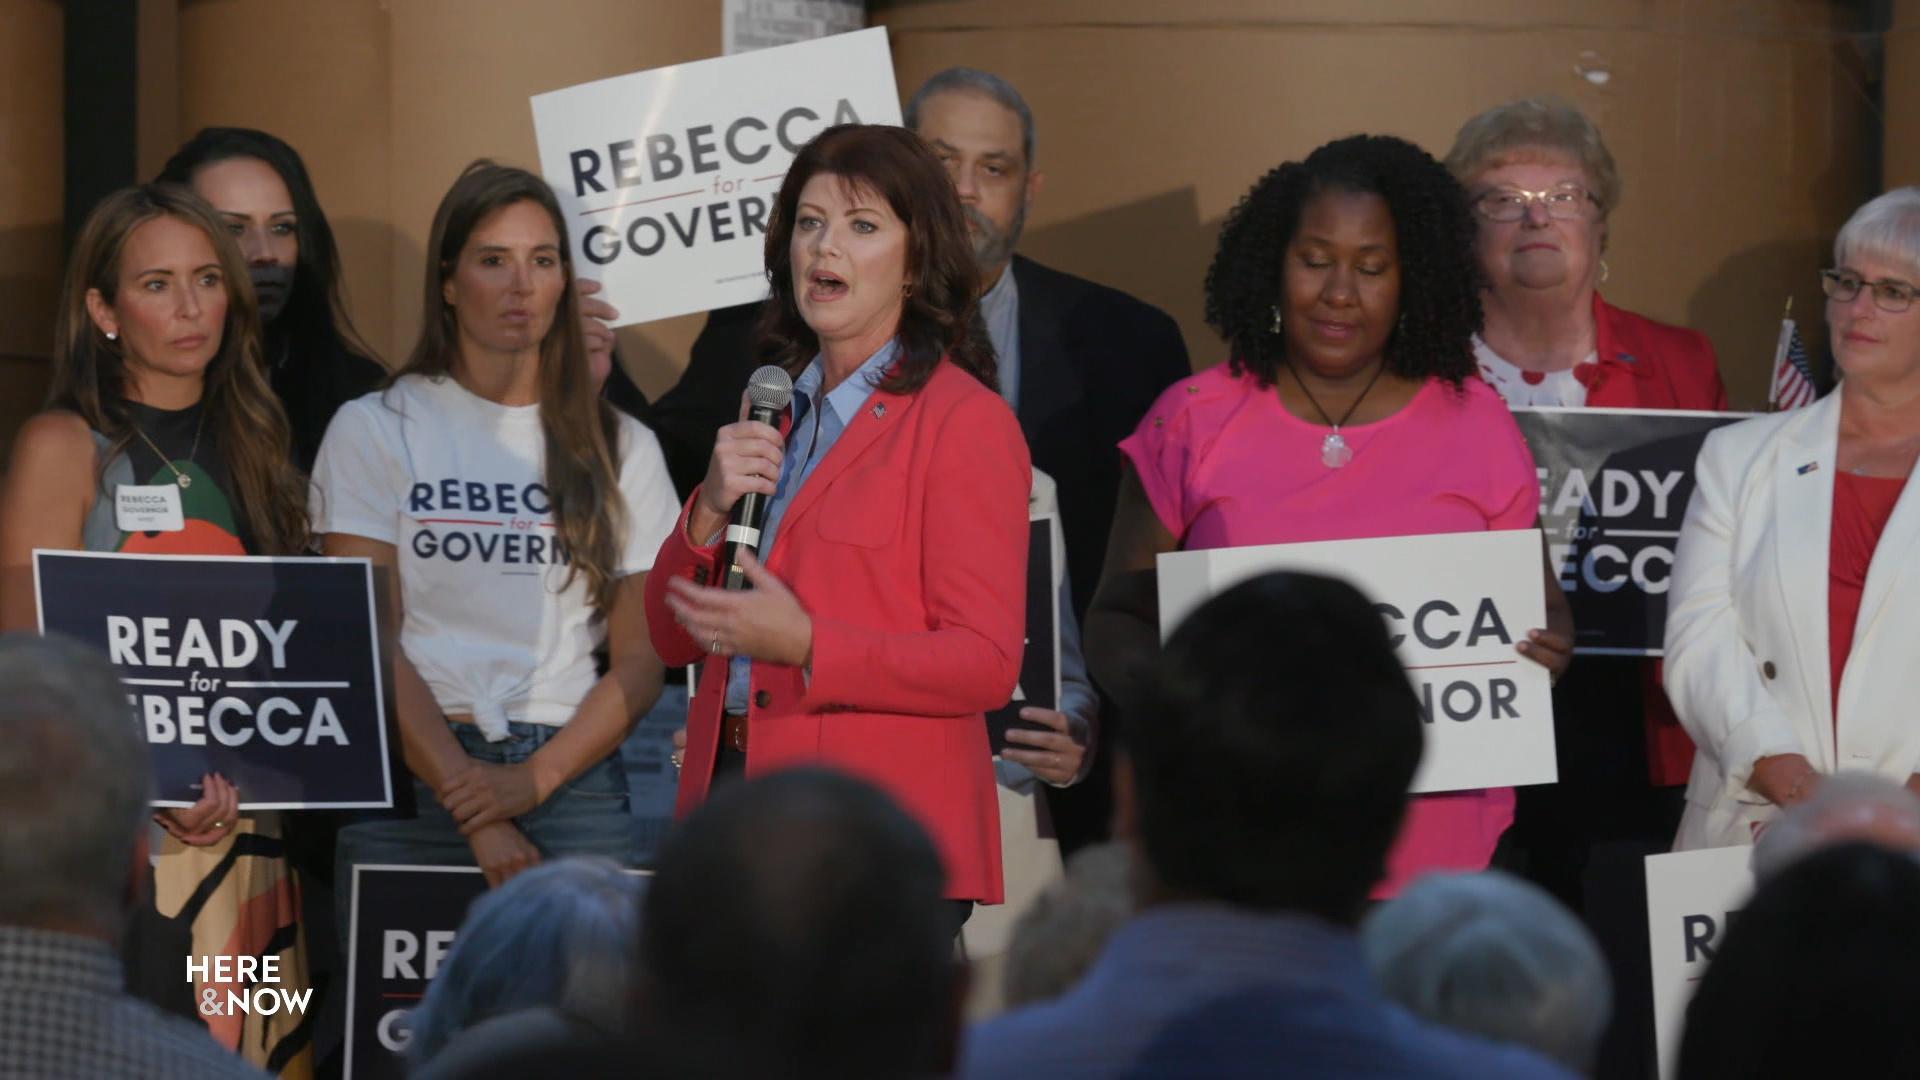 Rebecca Kleefisch Announces Campaign for Governor